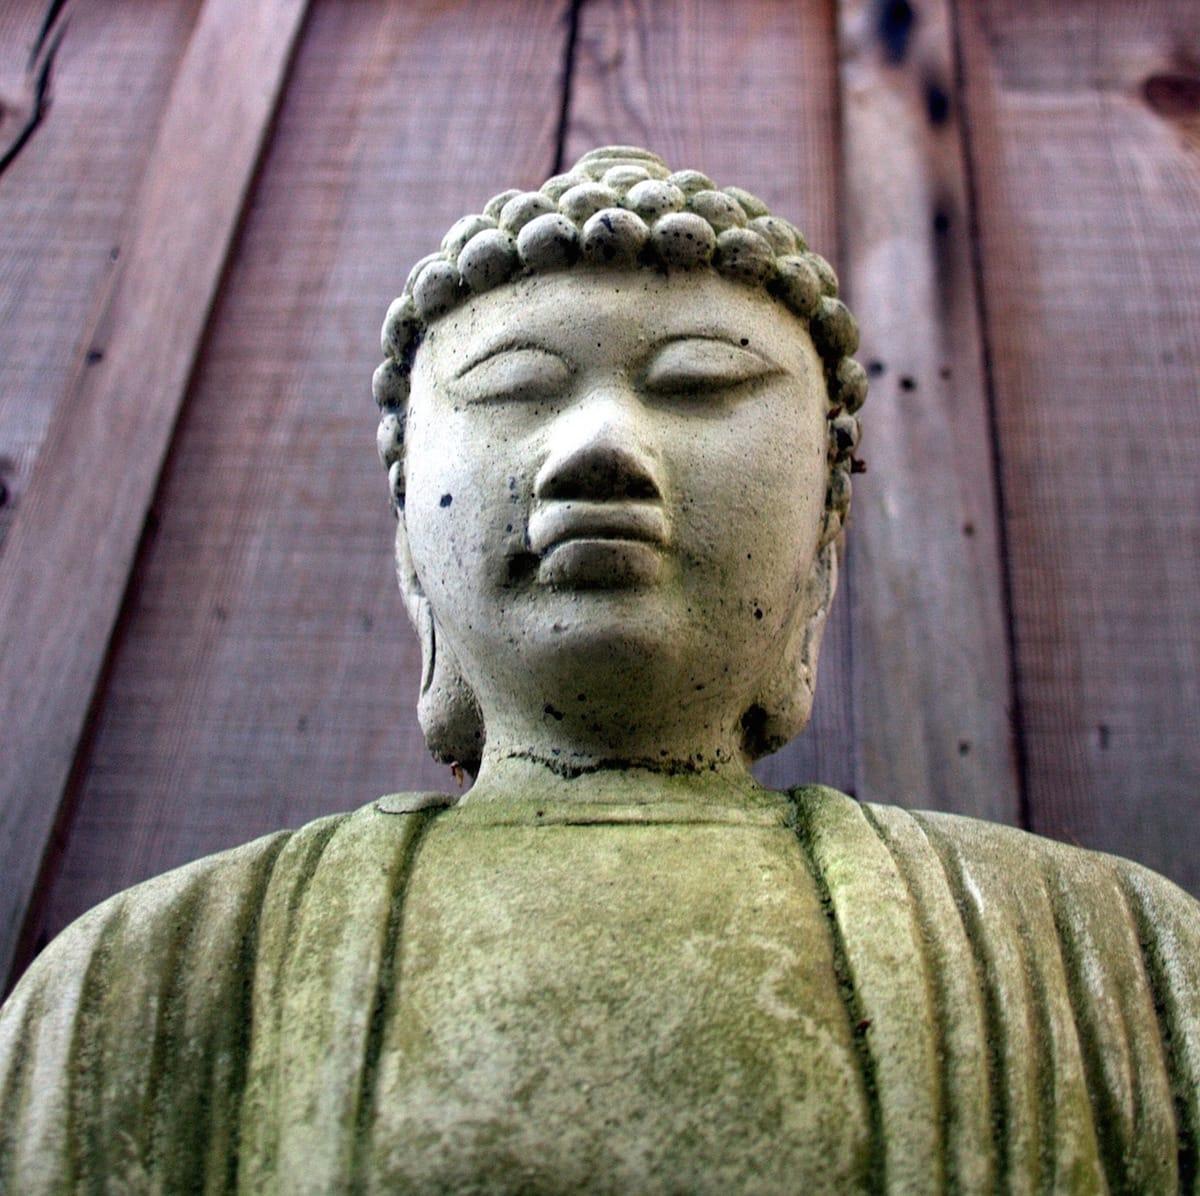 Sakyong Mipham, Shambhala Sun, Lion's Roar, Buddhism, Habits, Vajrayana/ Tibetan Buddhism